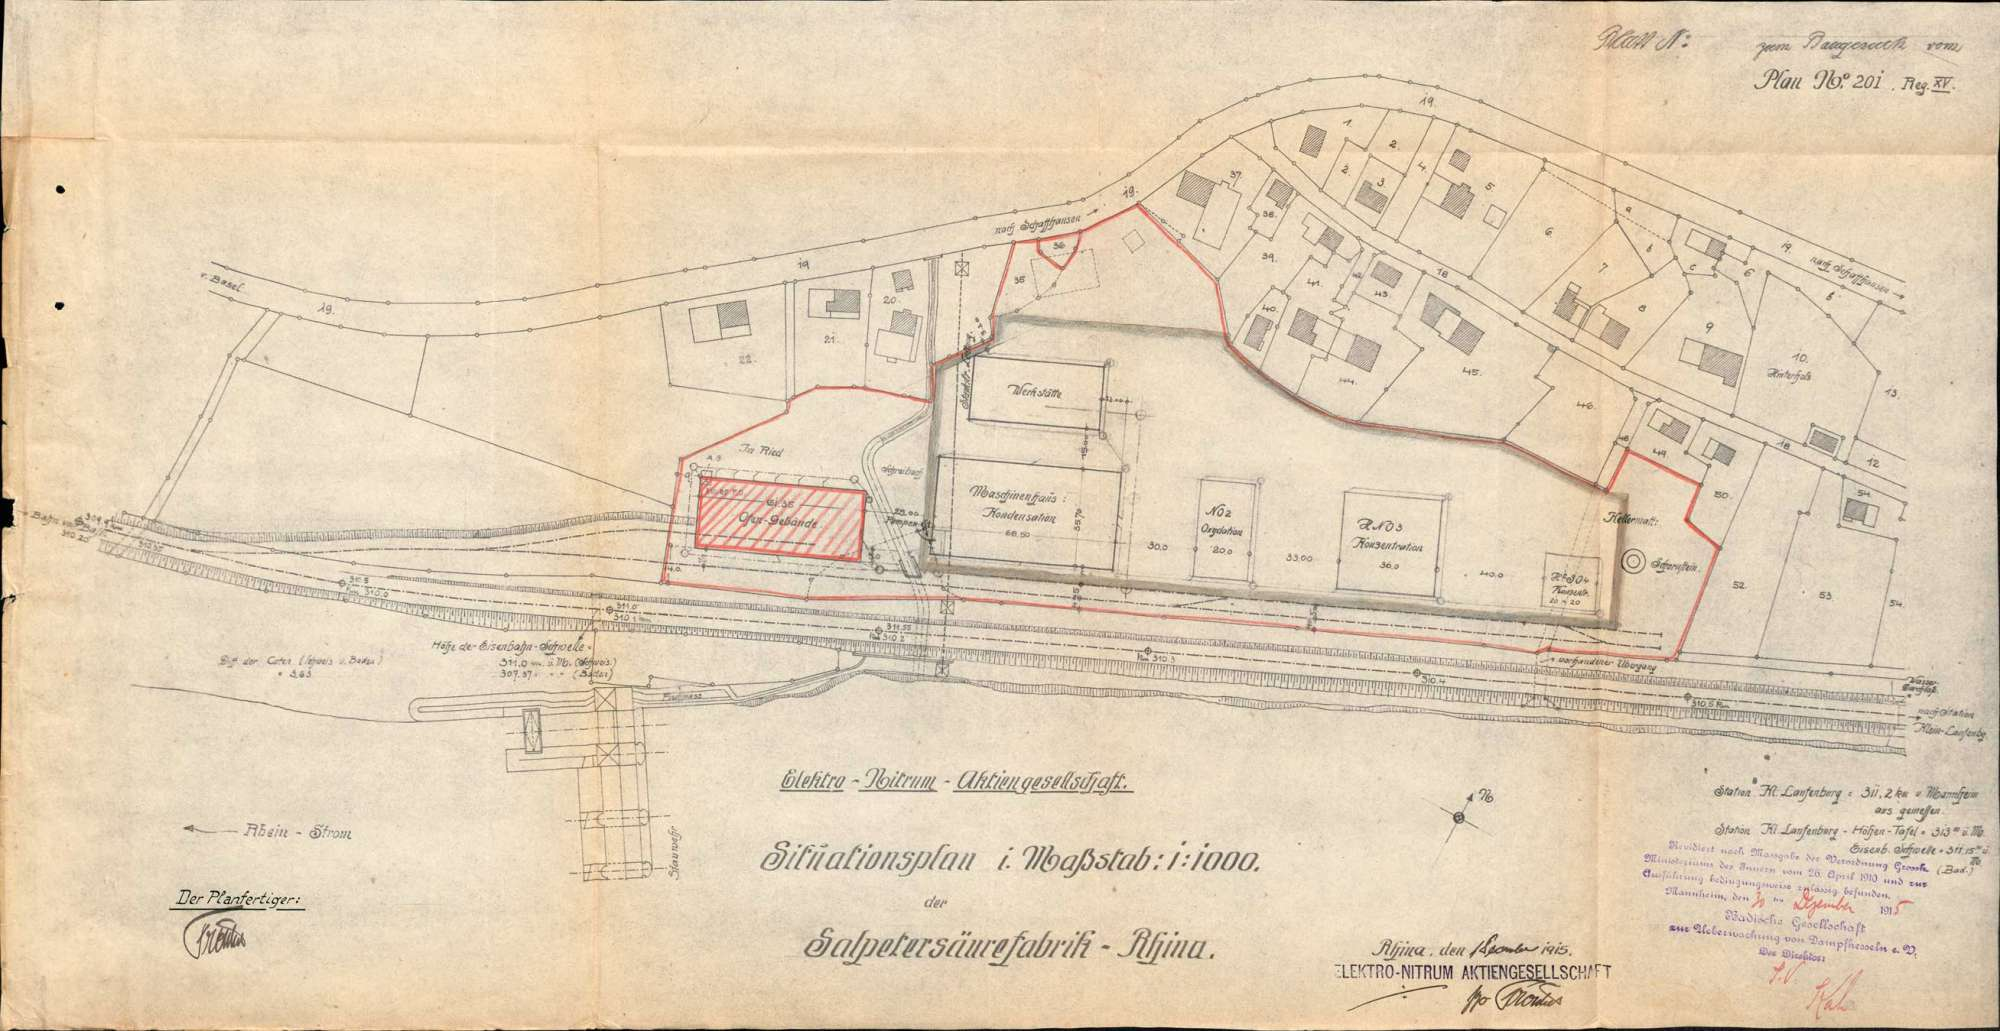 Dampfkessel der Firma Elektro-Nitrum AG in Rhina, Bild 1